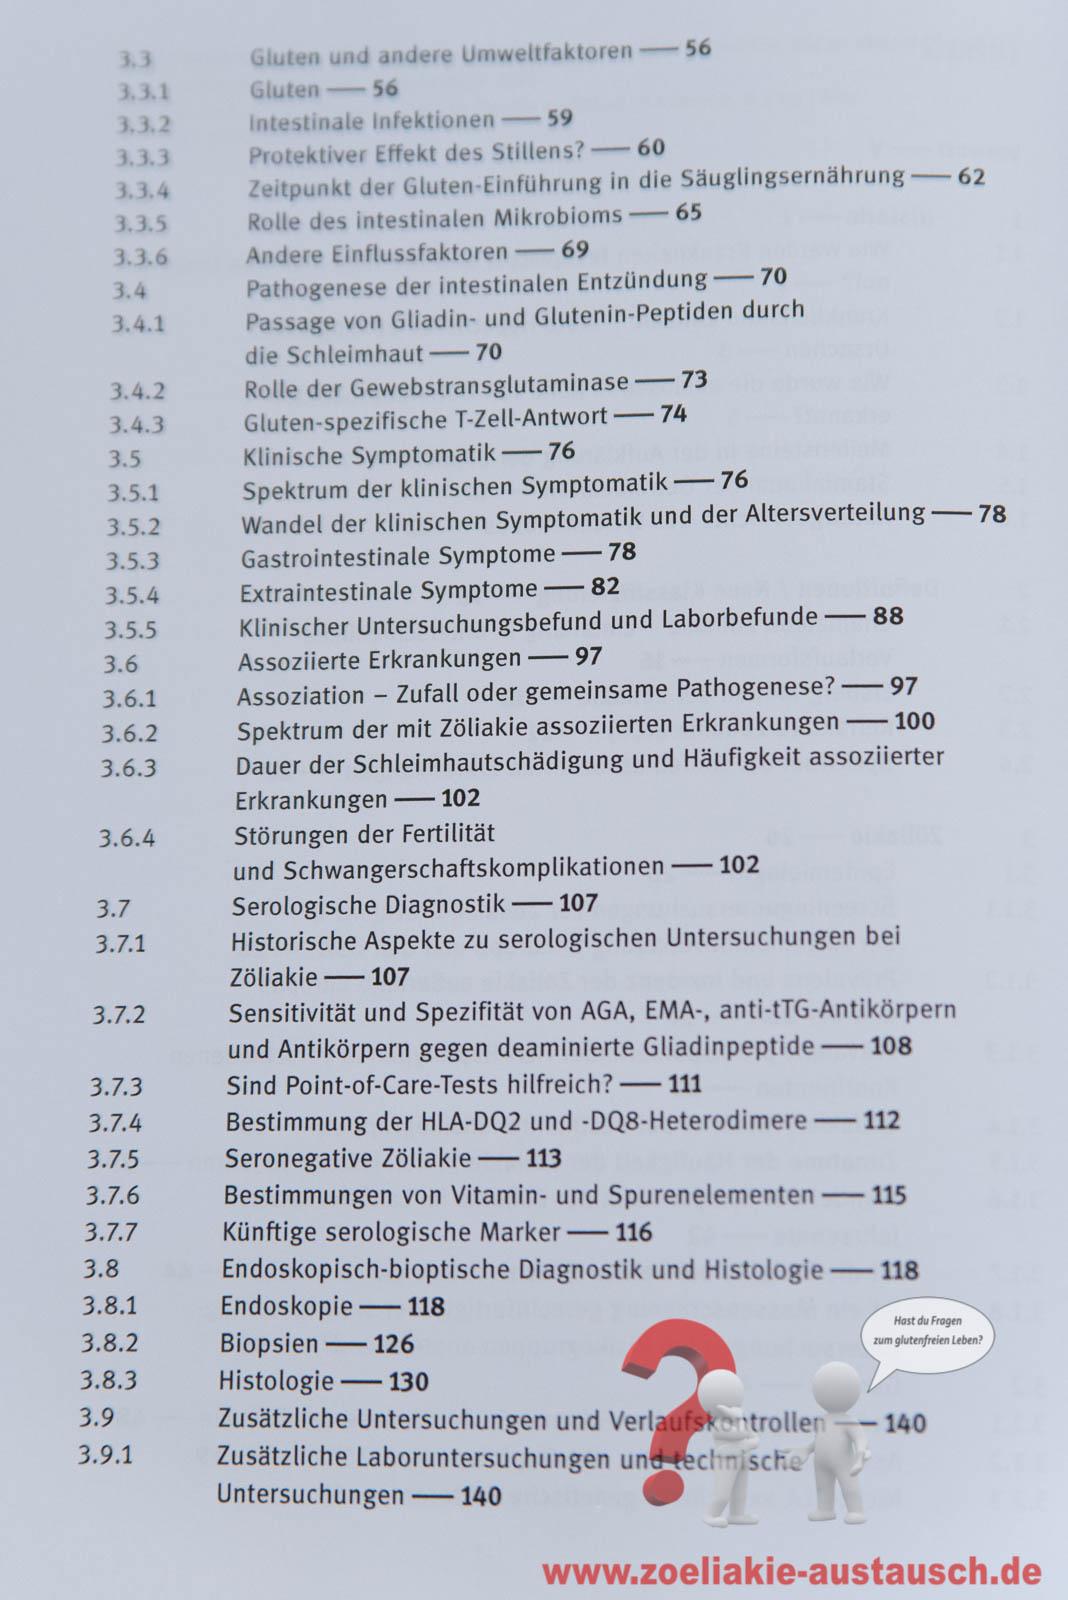 Gruyter-Leiss-Zoeliakie-20171224-JSC_4779